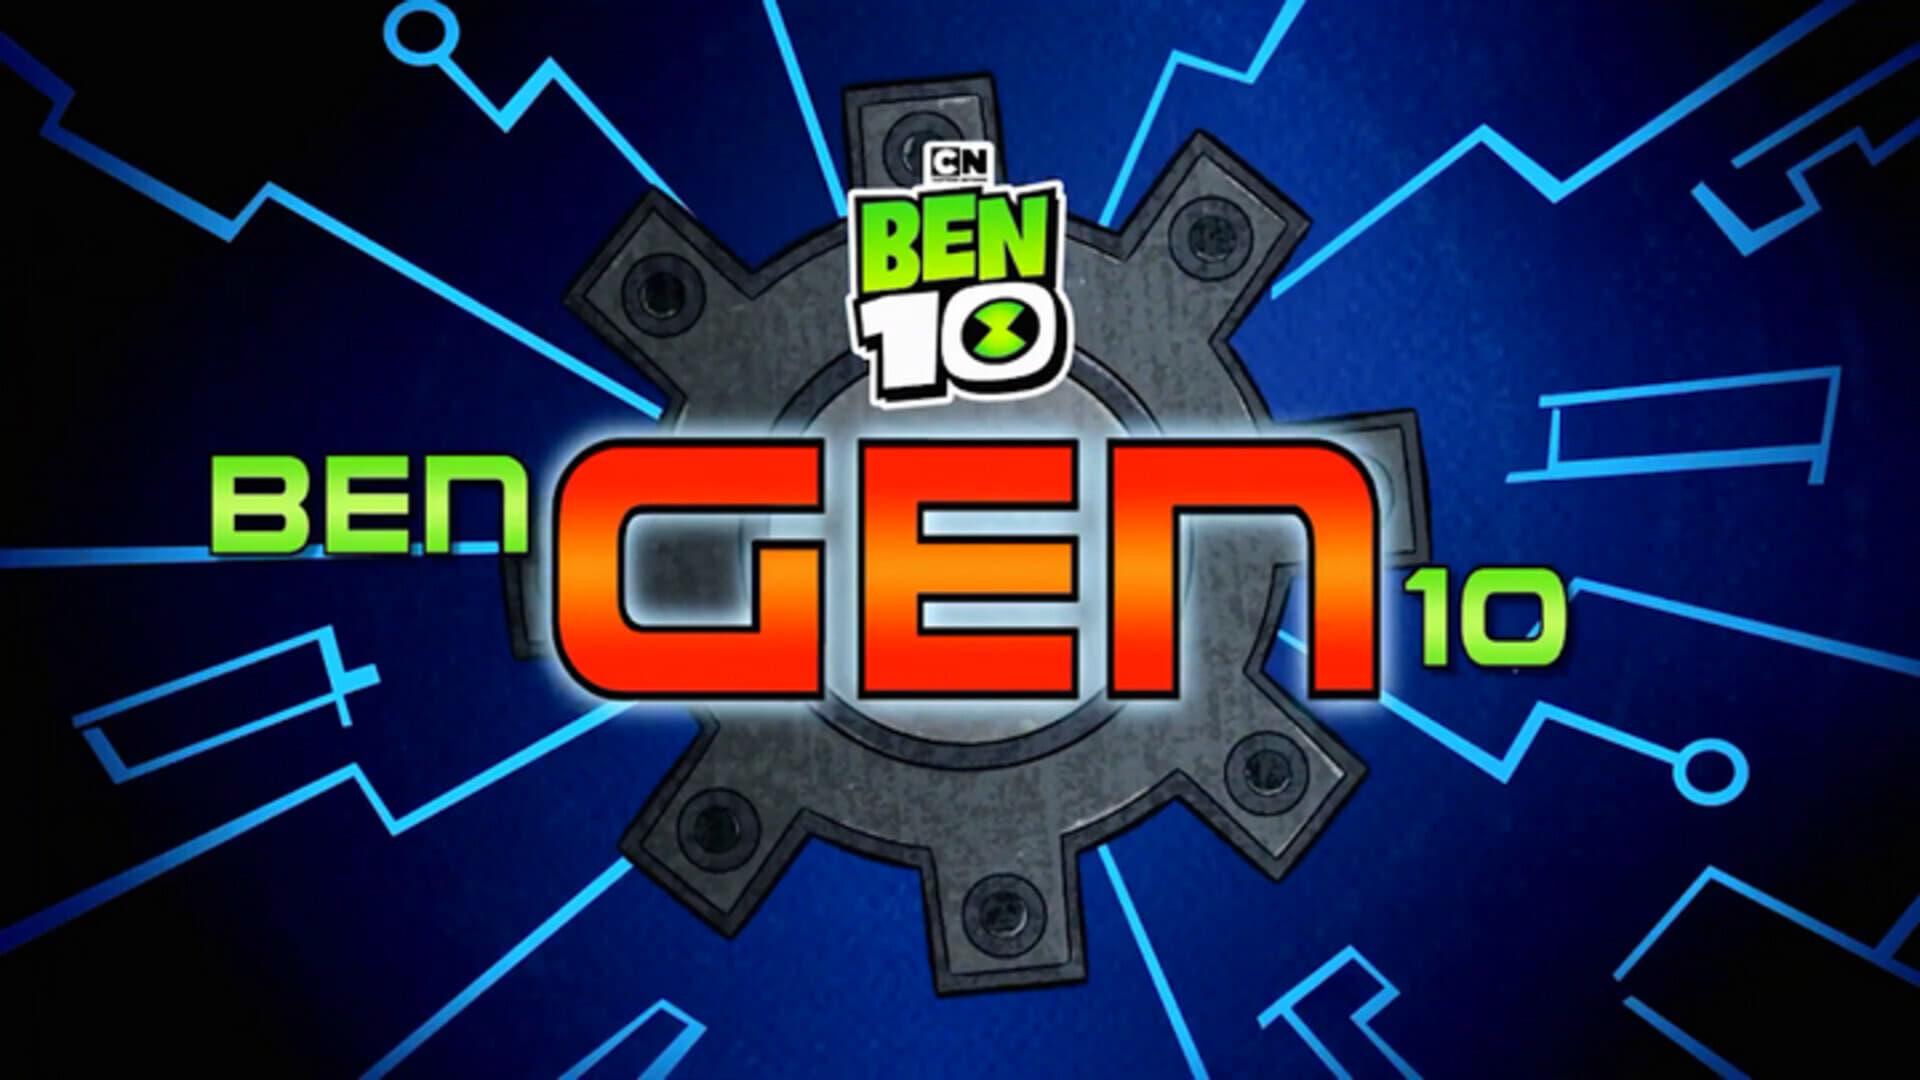 Ben Gen 10 (2021) movie download